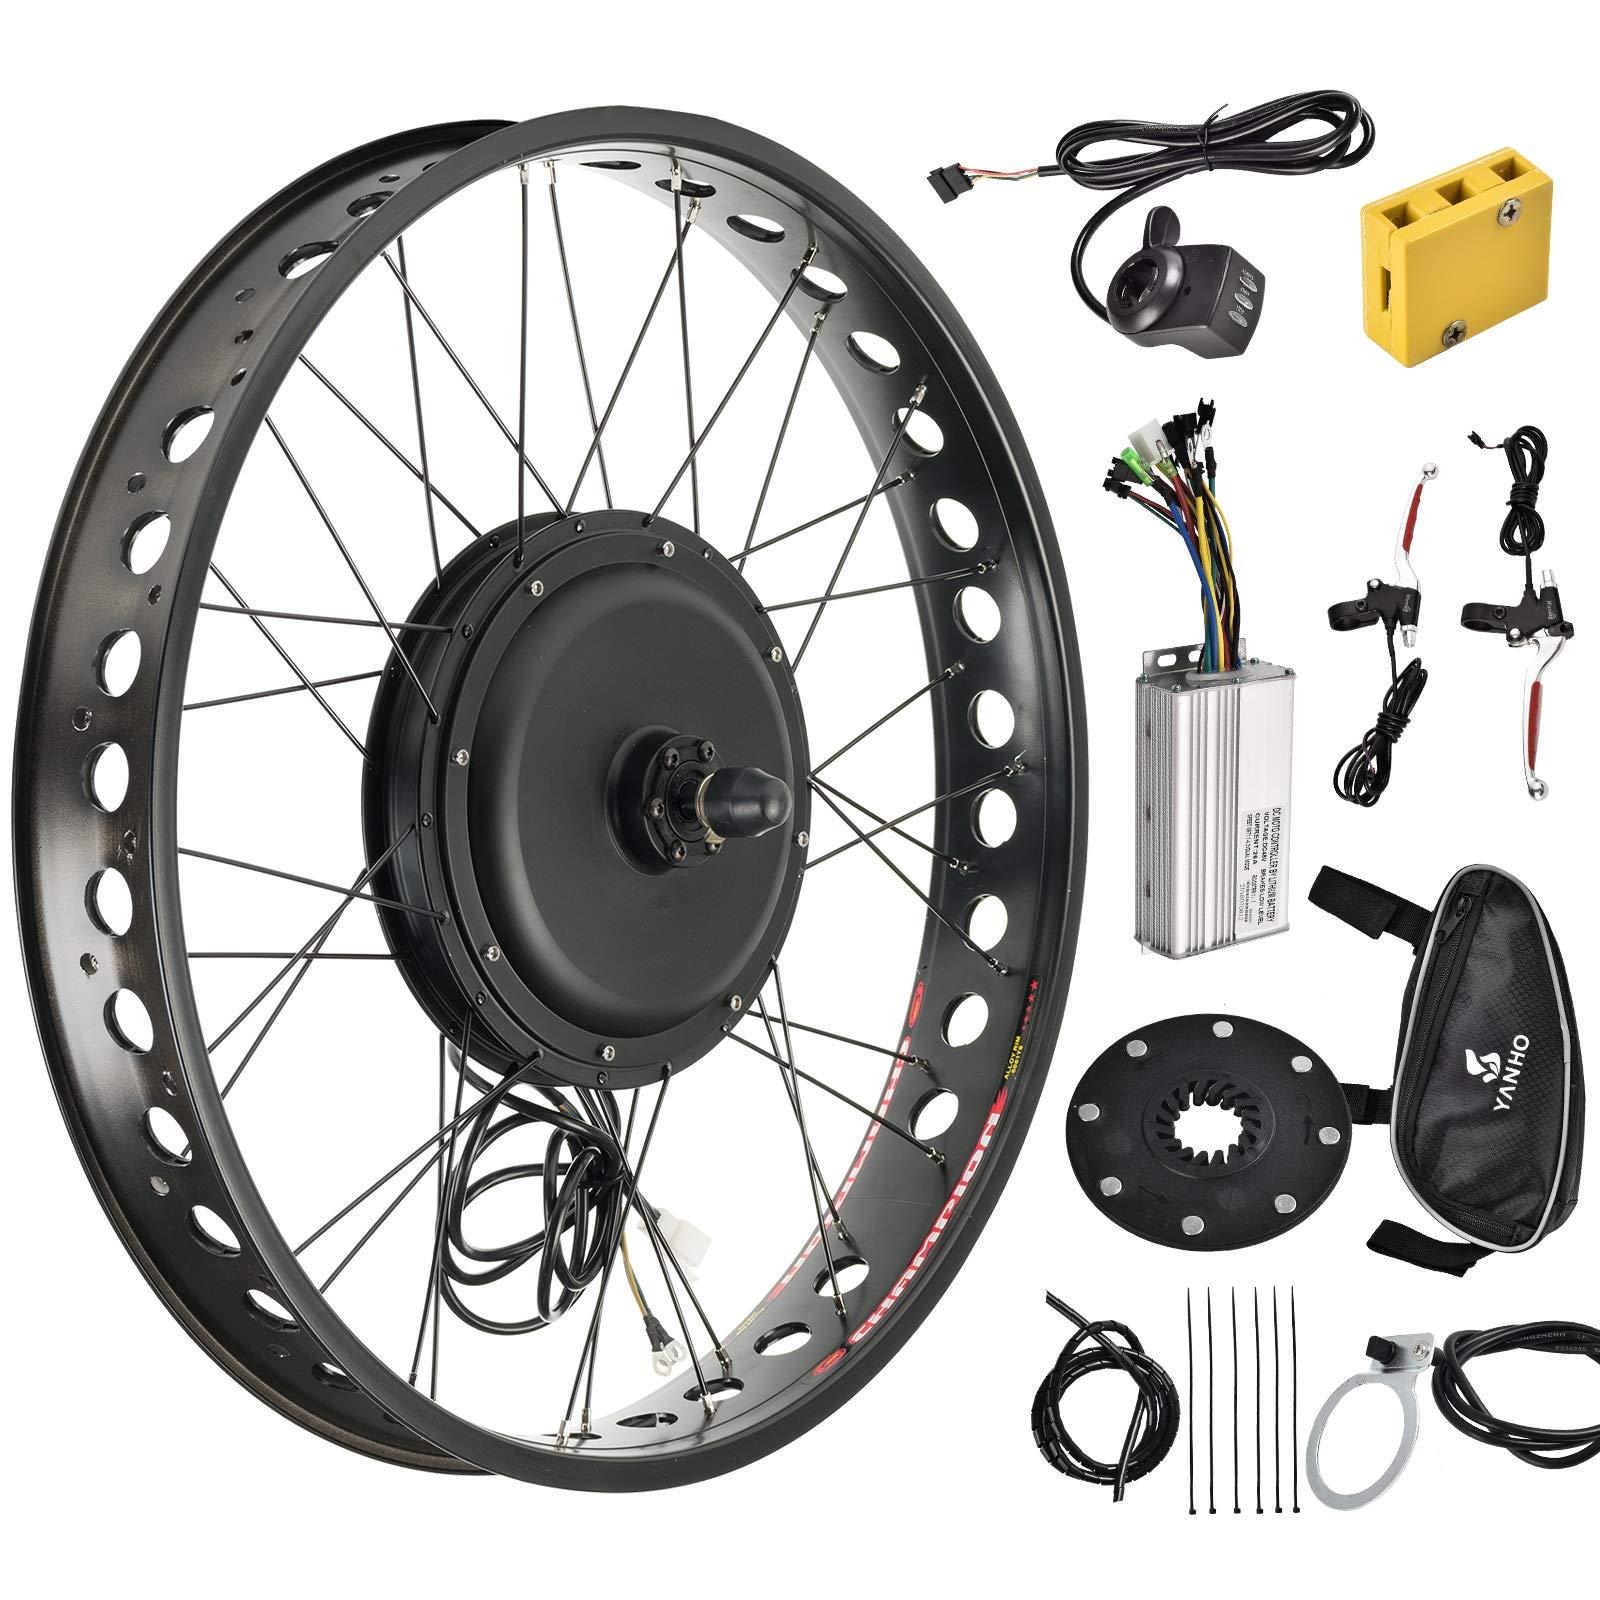 Murtisol Electric E-Bike Motor Kit 26'' Fat Tire Front Wheel 48V 1000W Bicycle Motor Conversion Kit